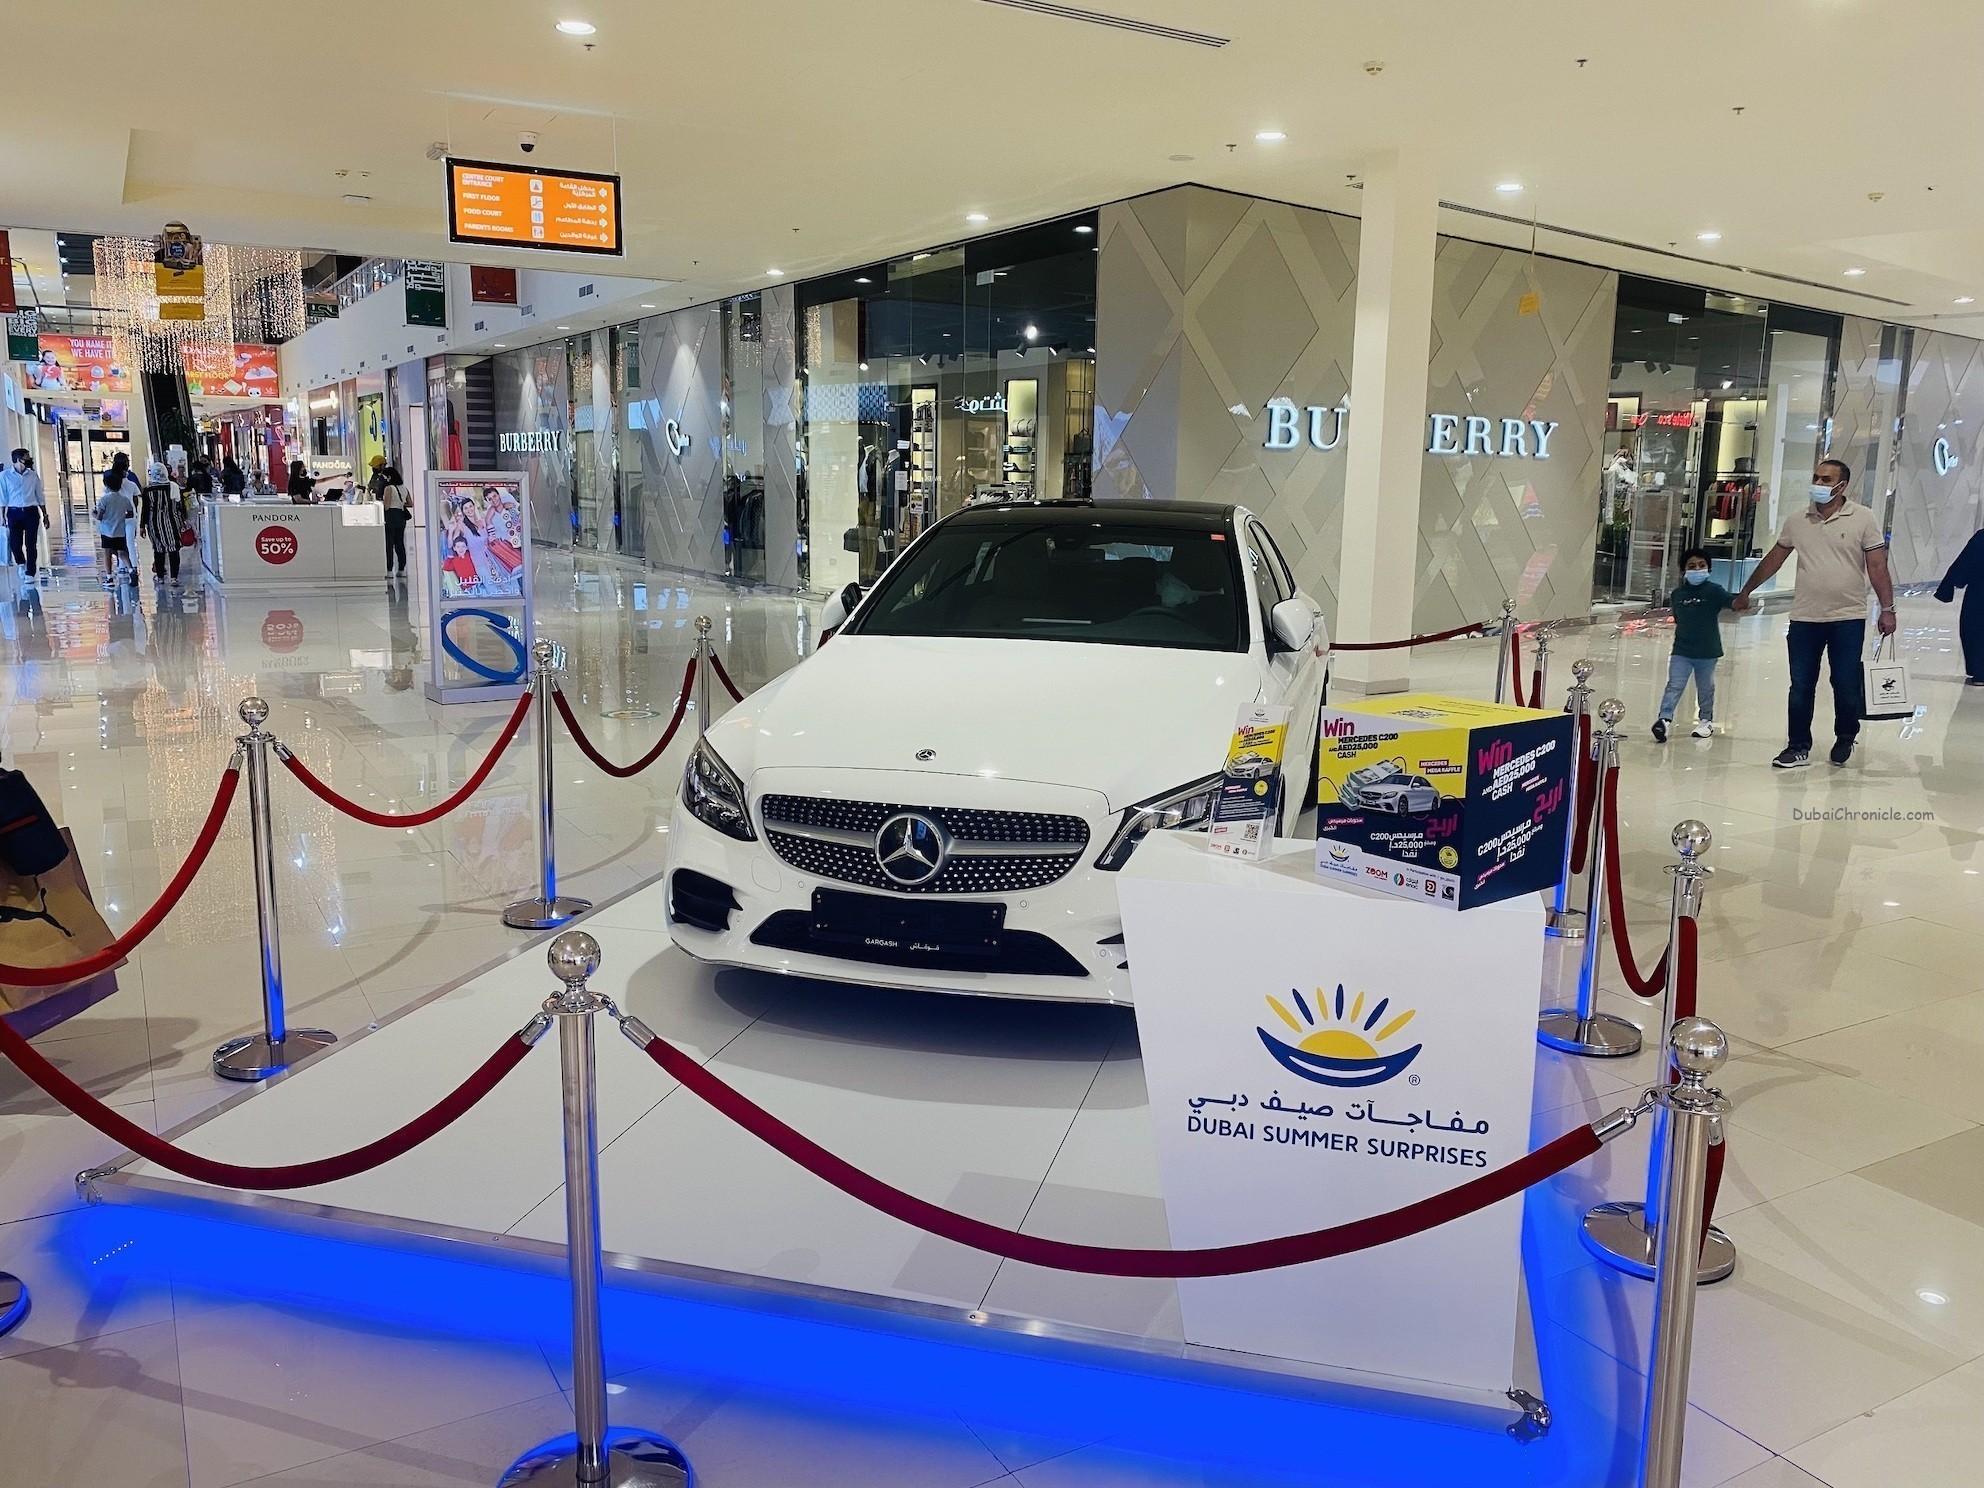 Dubai Festivals and Retail Establishment (DFRE) has teamed up with Idealz for the 24th edition of Dubai Summer Surprises (DSS).